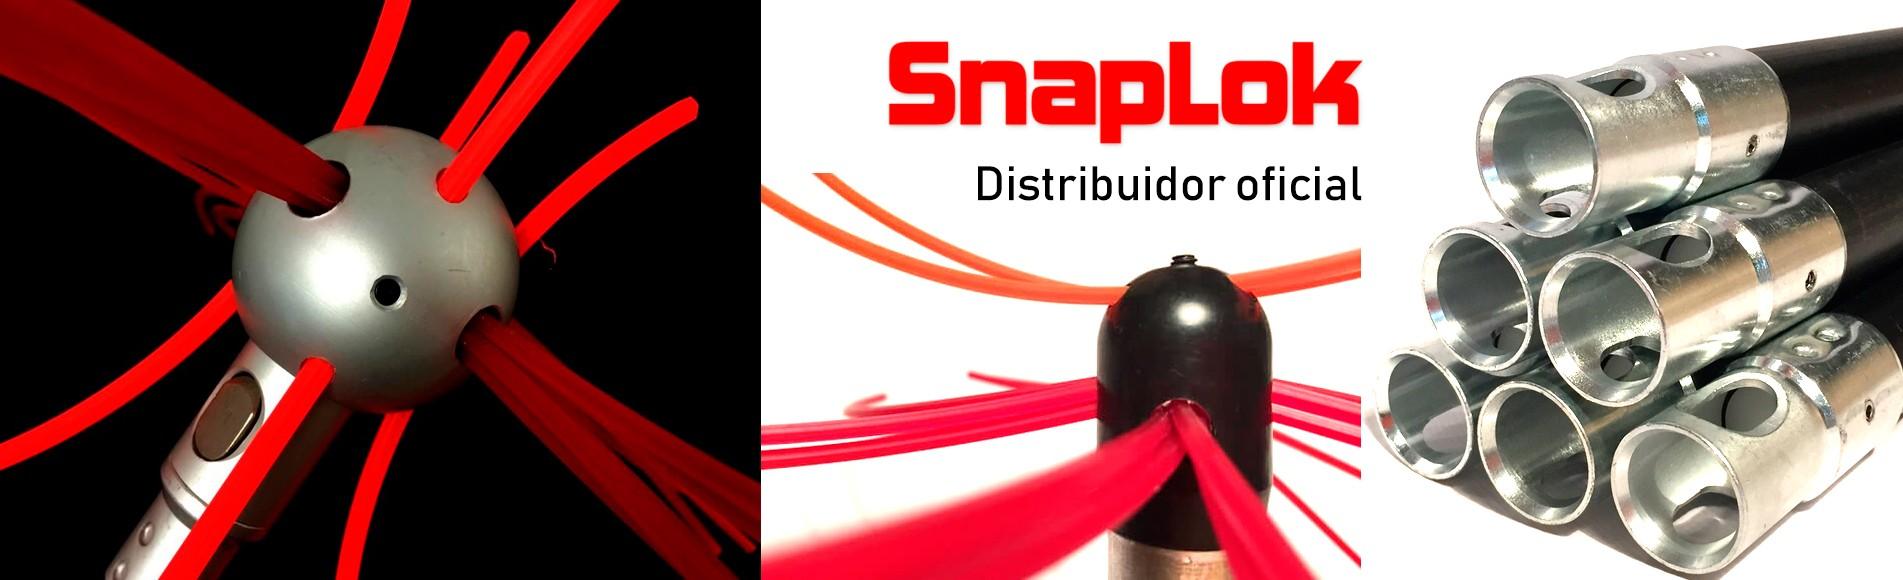 SnapLok